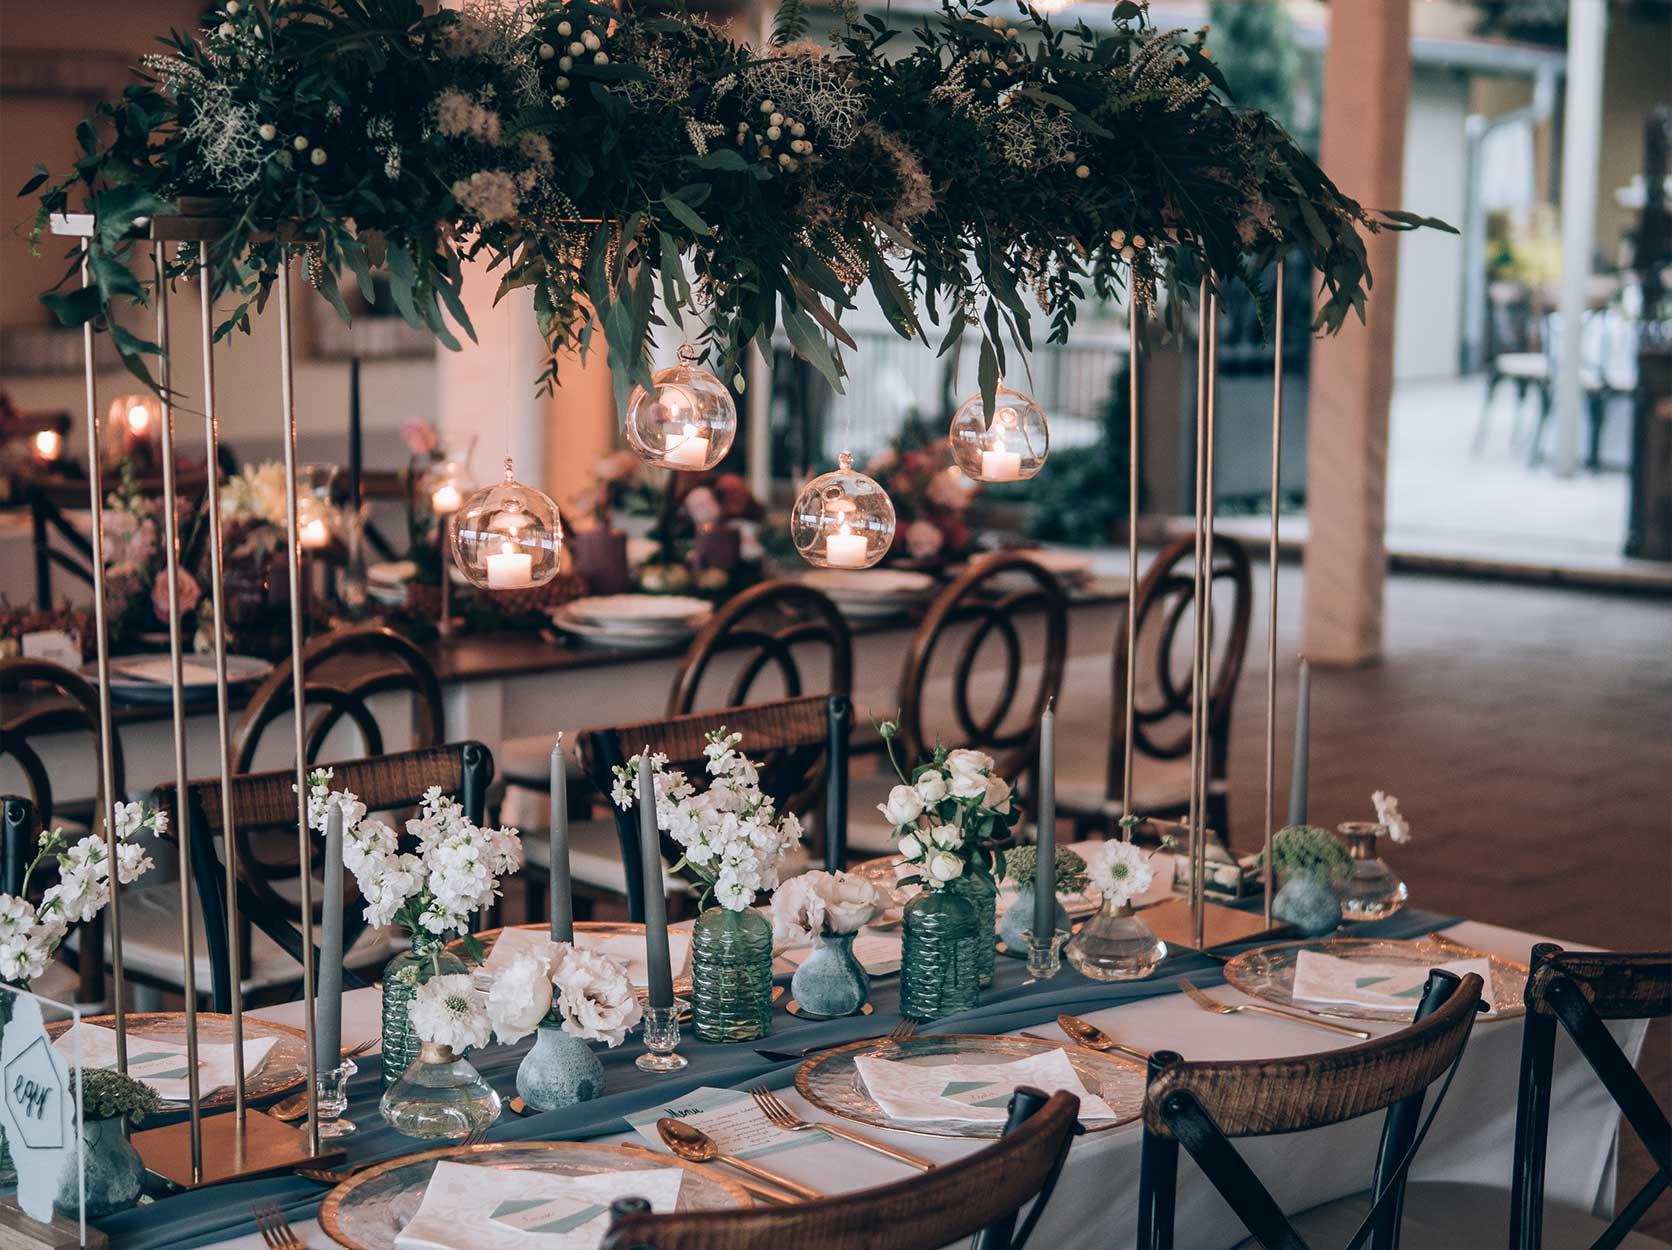 Dekorera festlokal bröllop